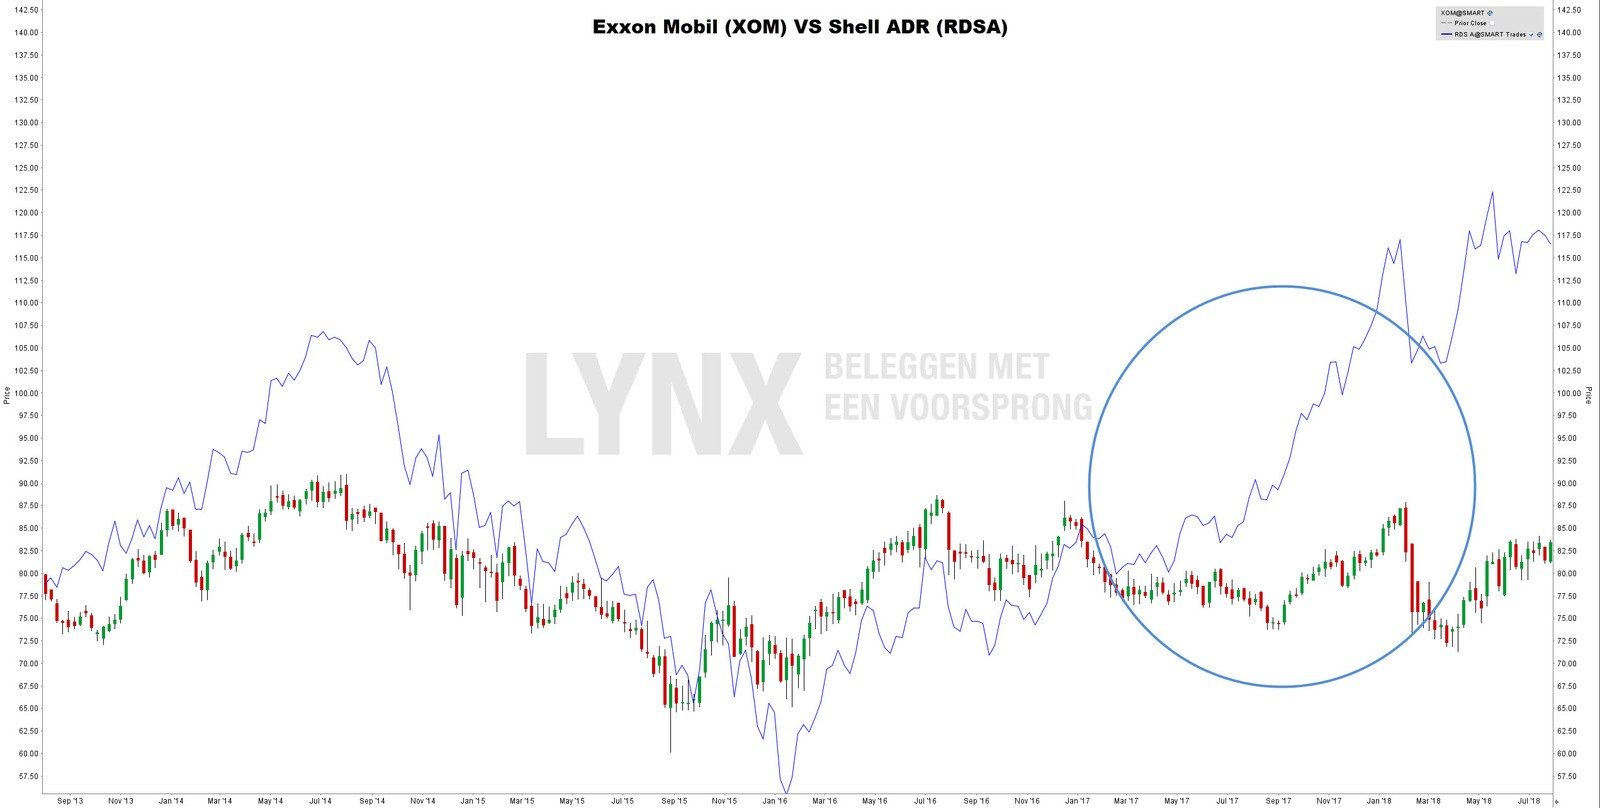 Shell vs. Exxon Mobil